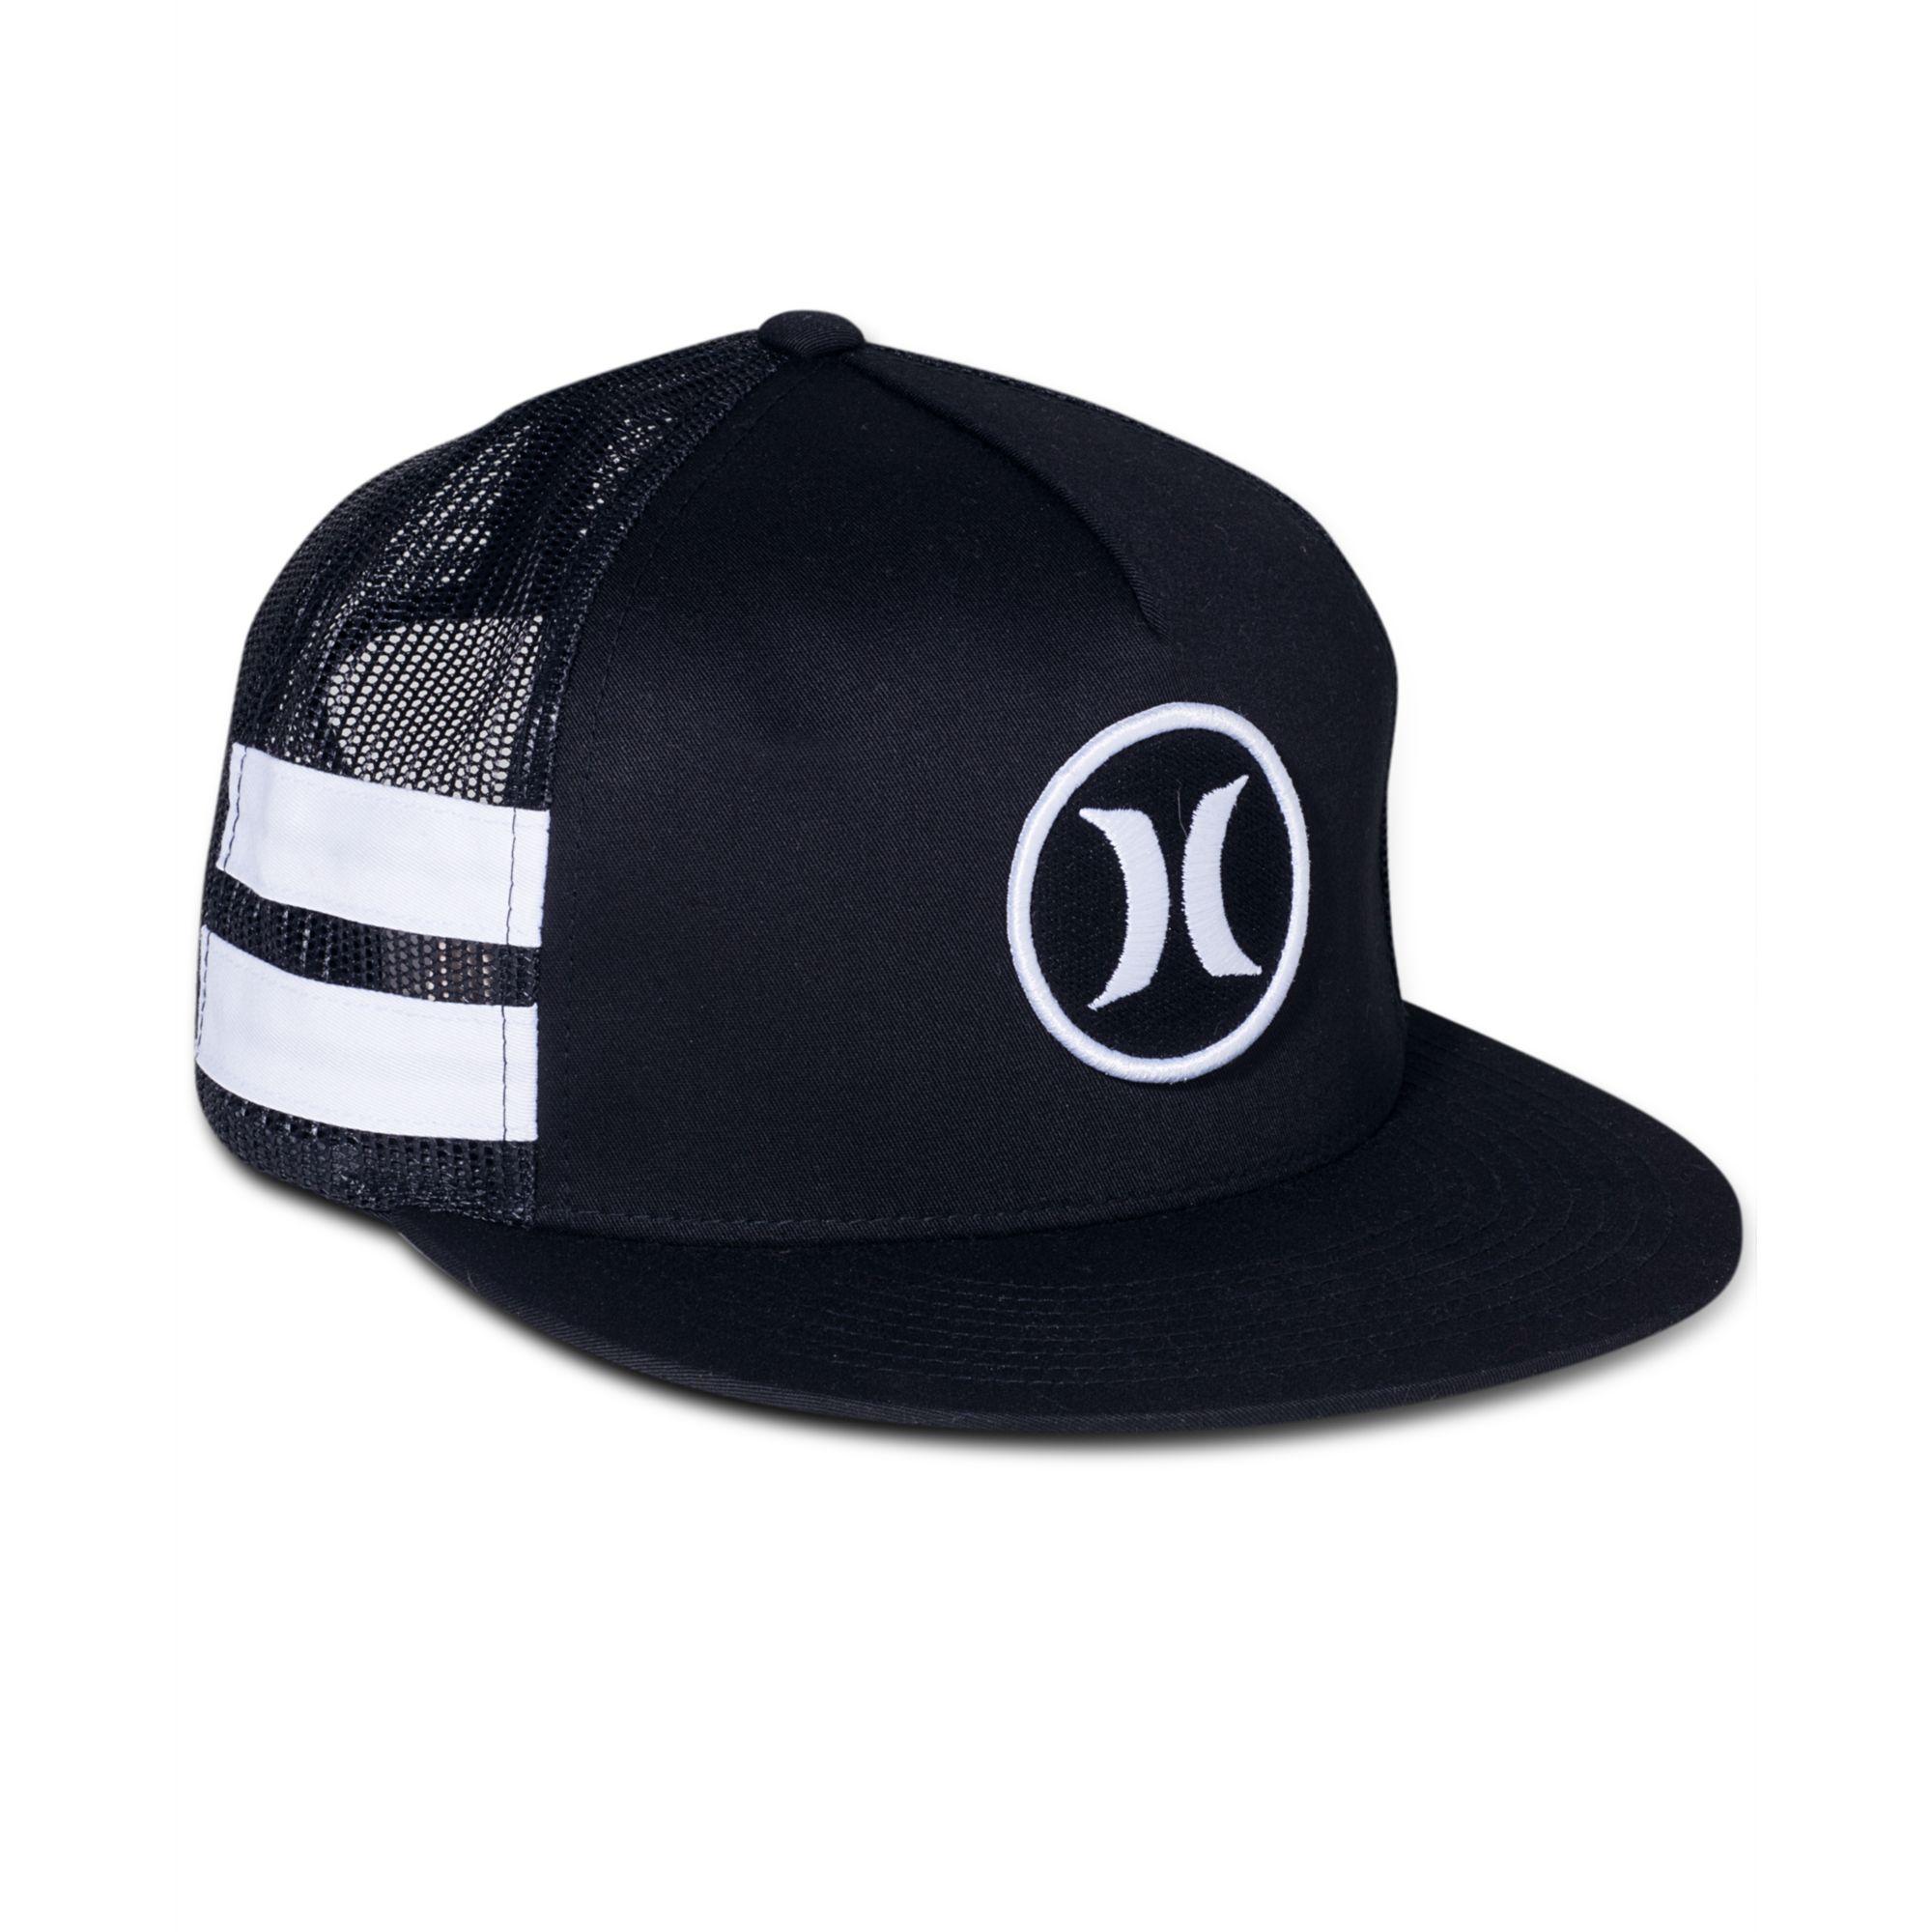 Lyst - Hurley Block Party Trucker Hat in Black for Men 2c88044311a7